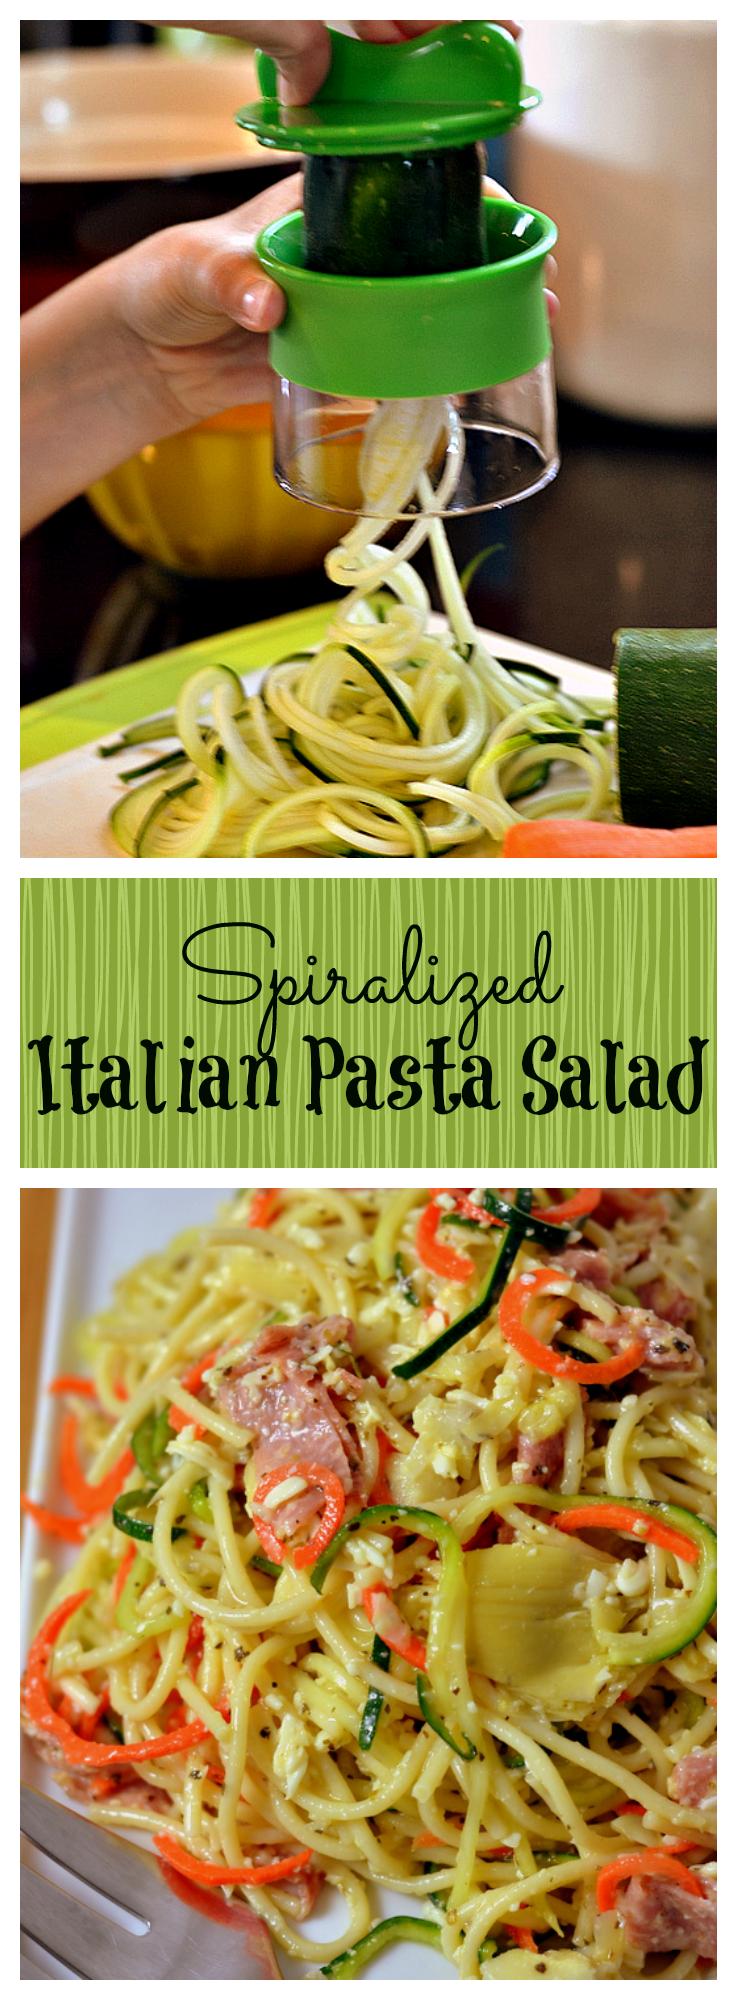 Spiralized Italian Pasta Salad - Chew Nibble Nosh..